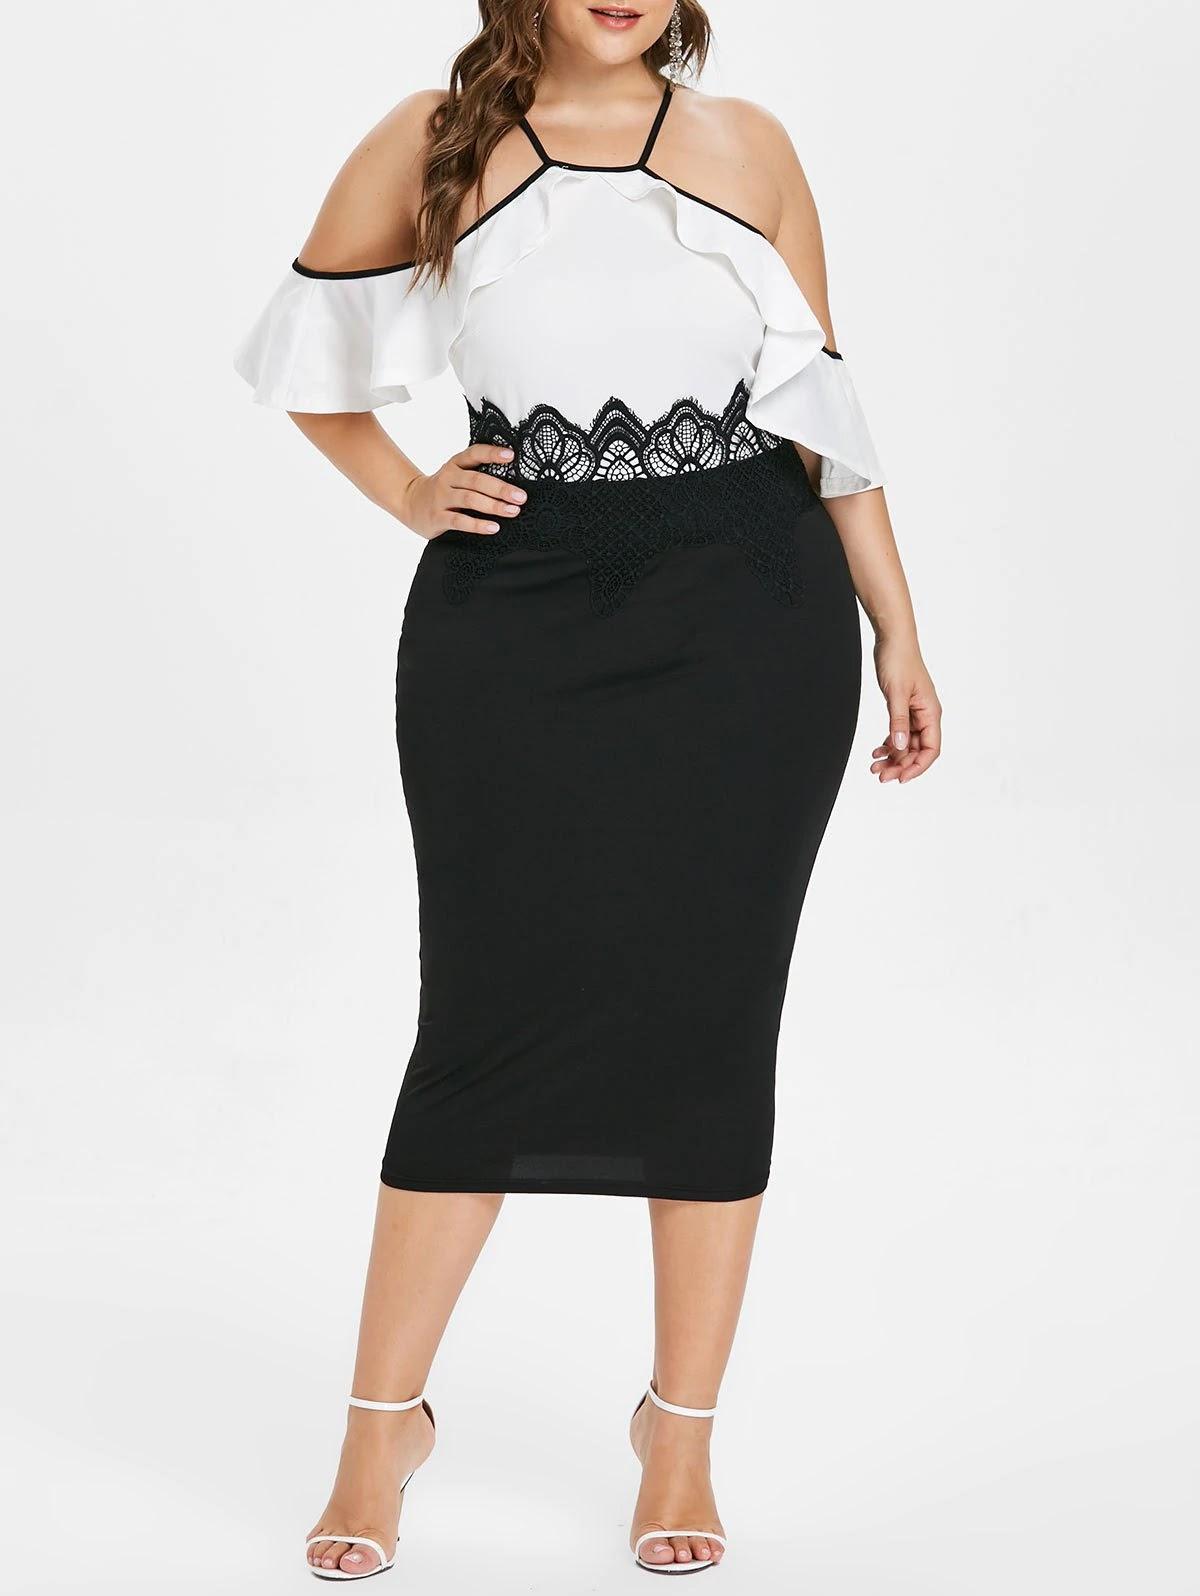 Open Shoulder Ruffle Trim Plus Size Dress